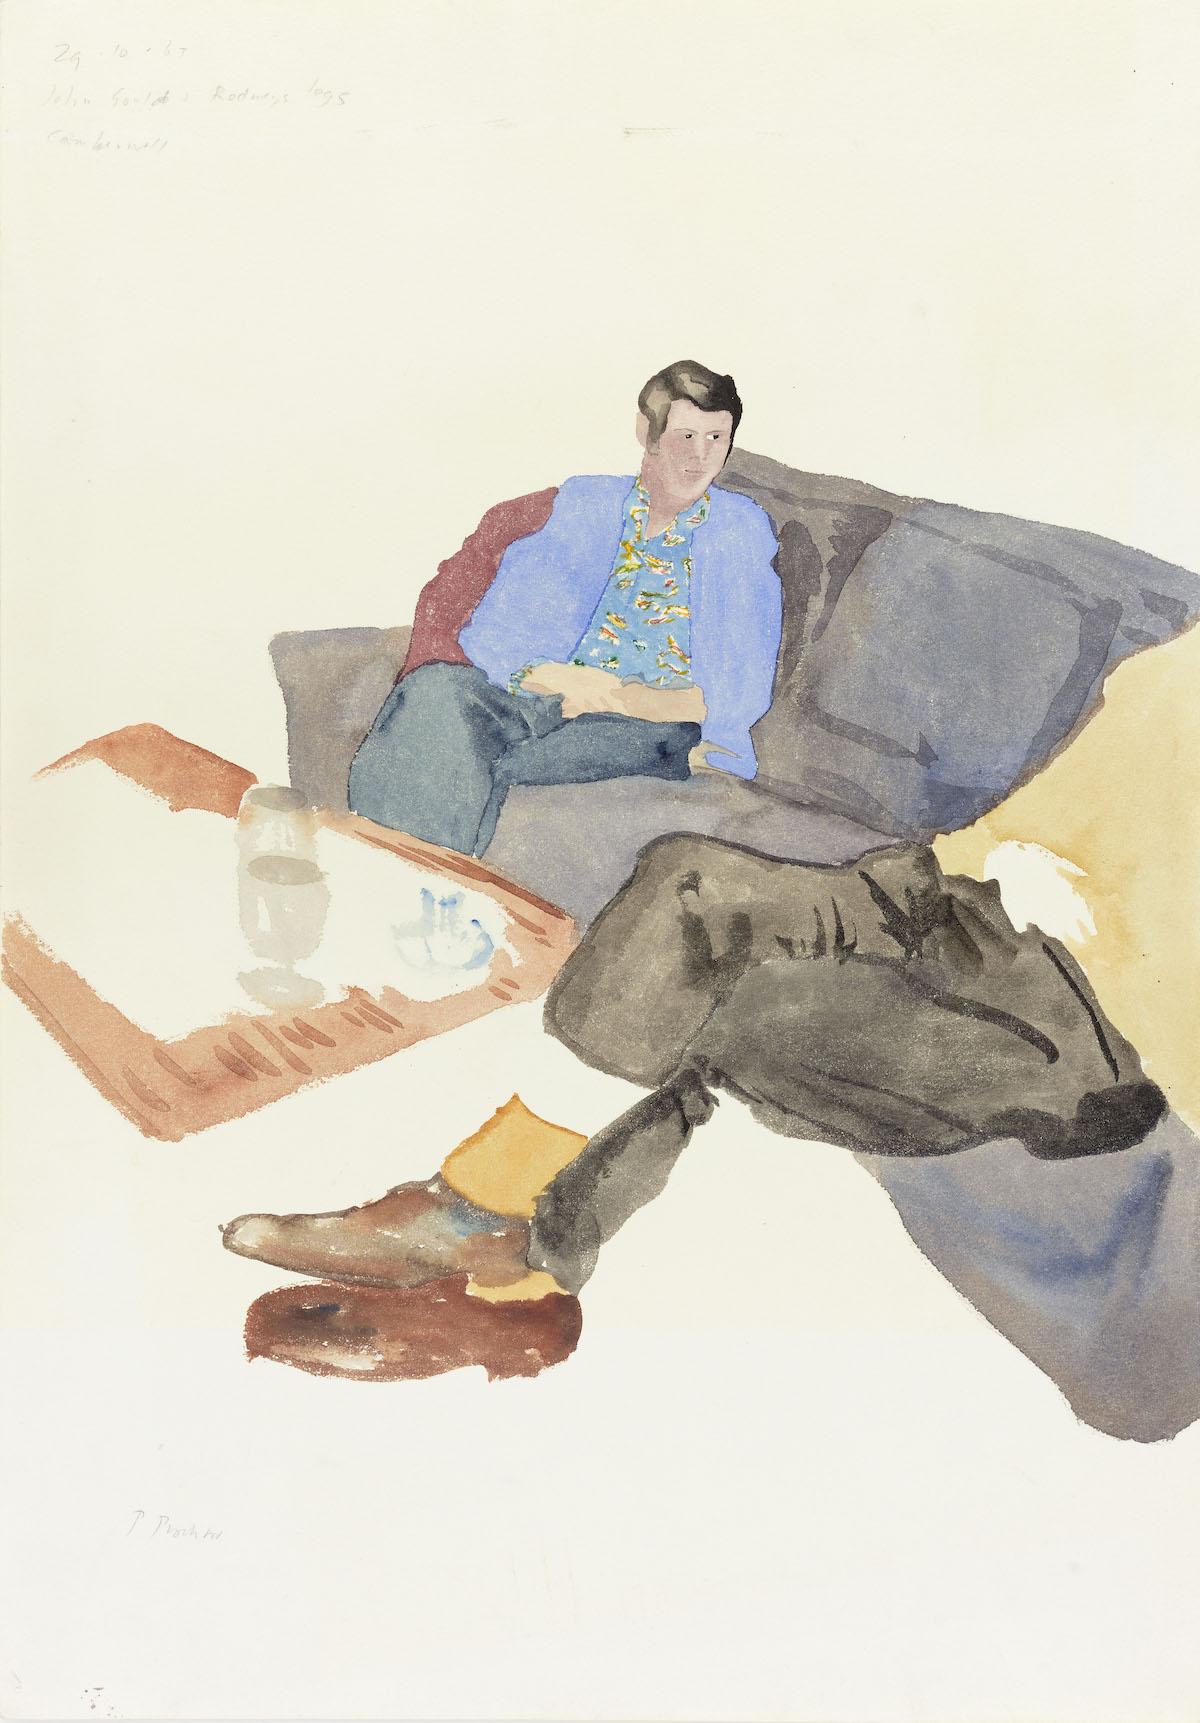 Patrick Procktor, John Gould and Rodney's Legs, Camberwell, 1965